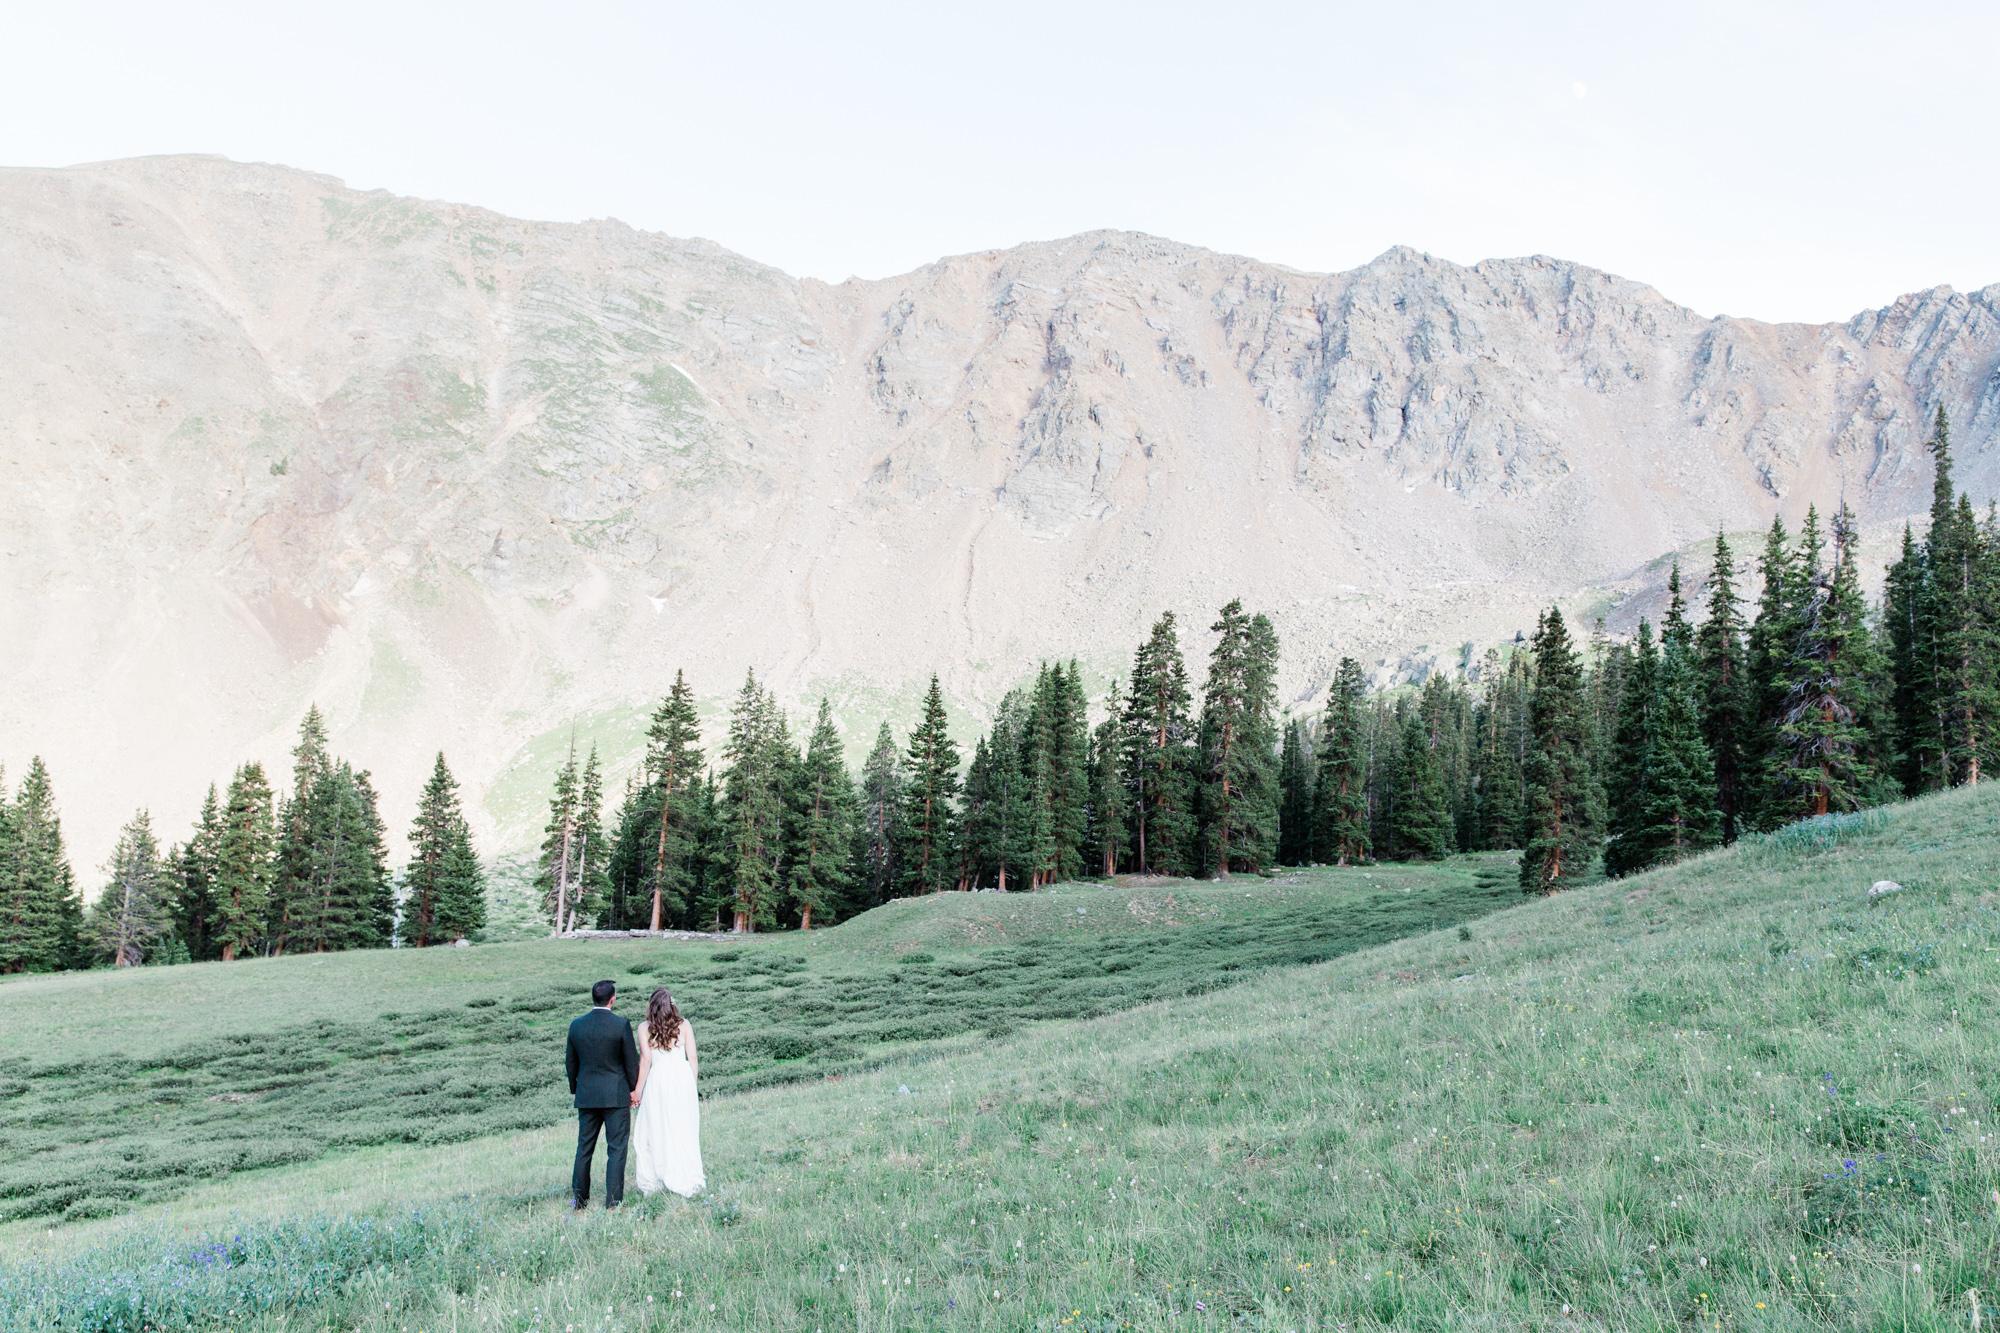 2019-08-09-Wedding-Kate-Hunter-ArapahoeBasin-3633.jpg